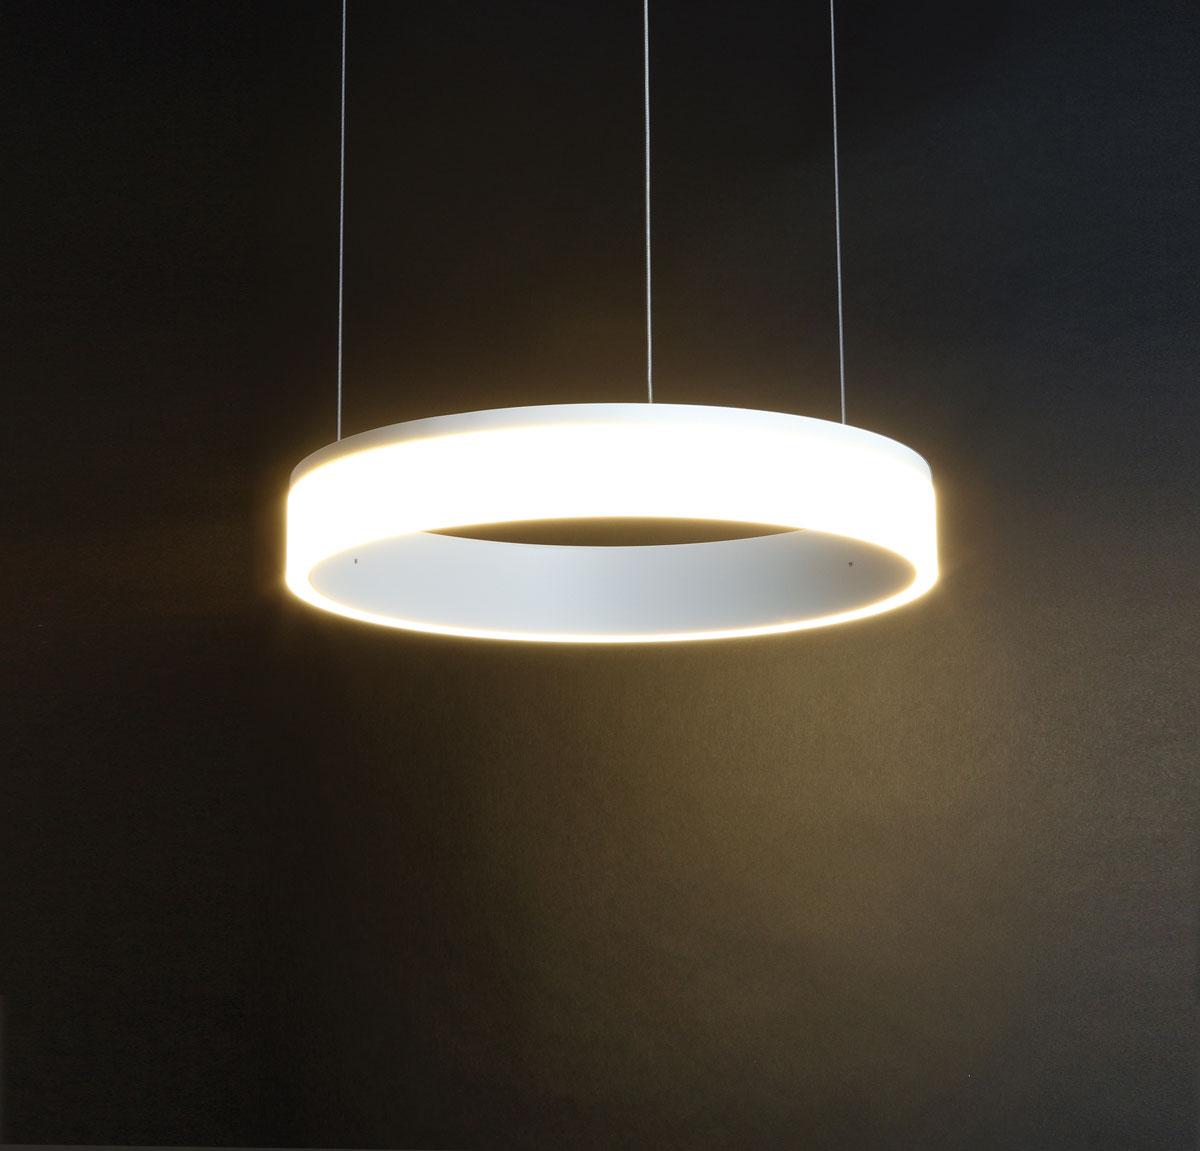 Závěsné svítidlo Maxlight Orbit 1, P0015